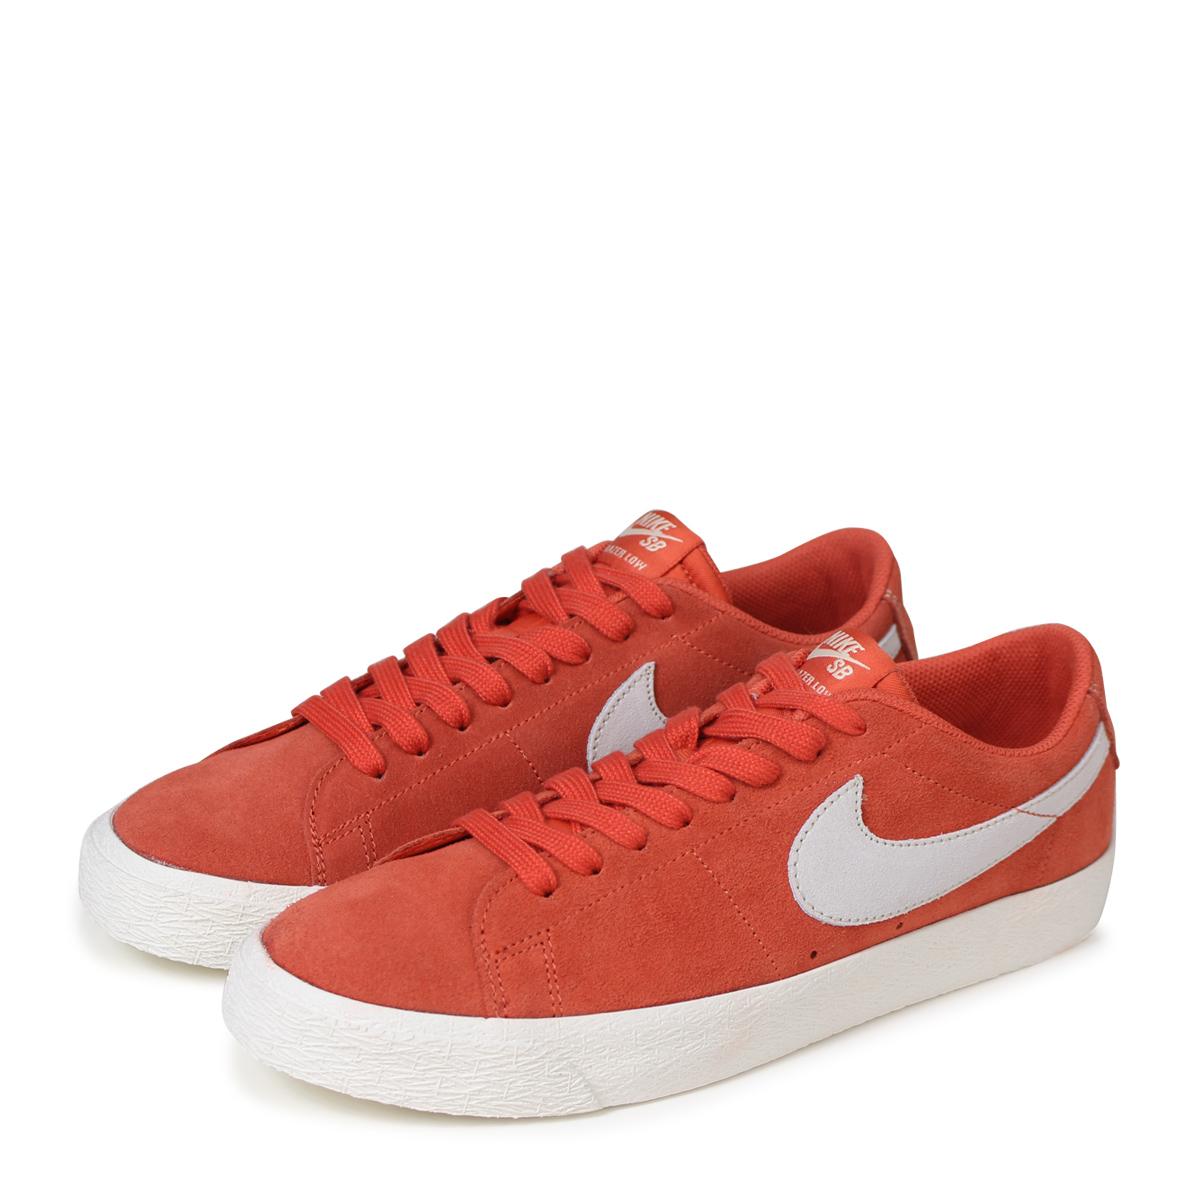 huge discount 9c740 a42b2 An NIKE BLAZER ZOOM LOW Nike SB blazer low sneakers men 864,347-800 orange  ...